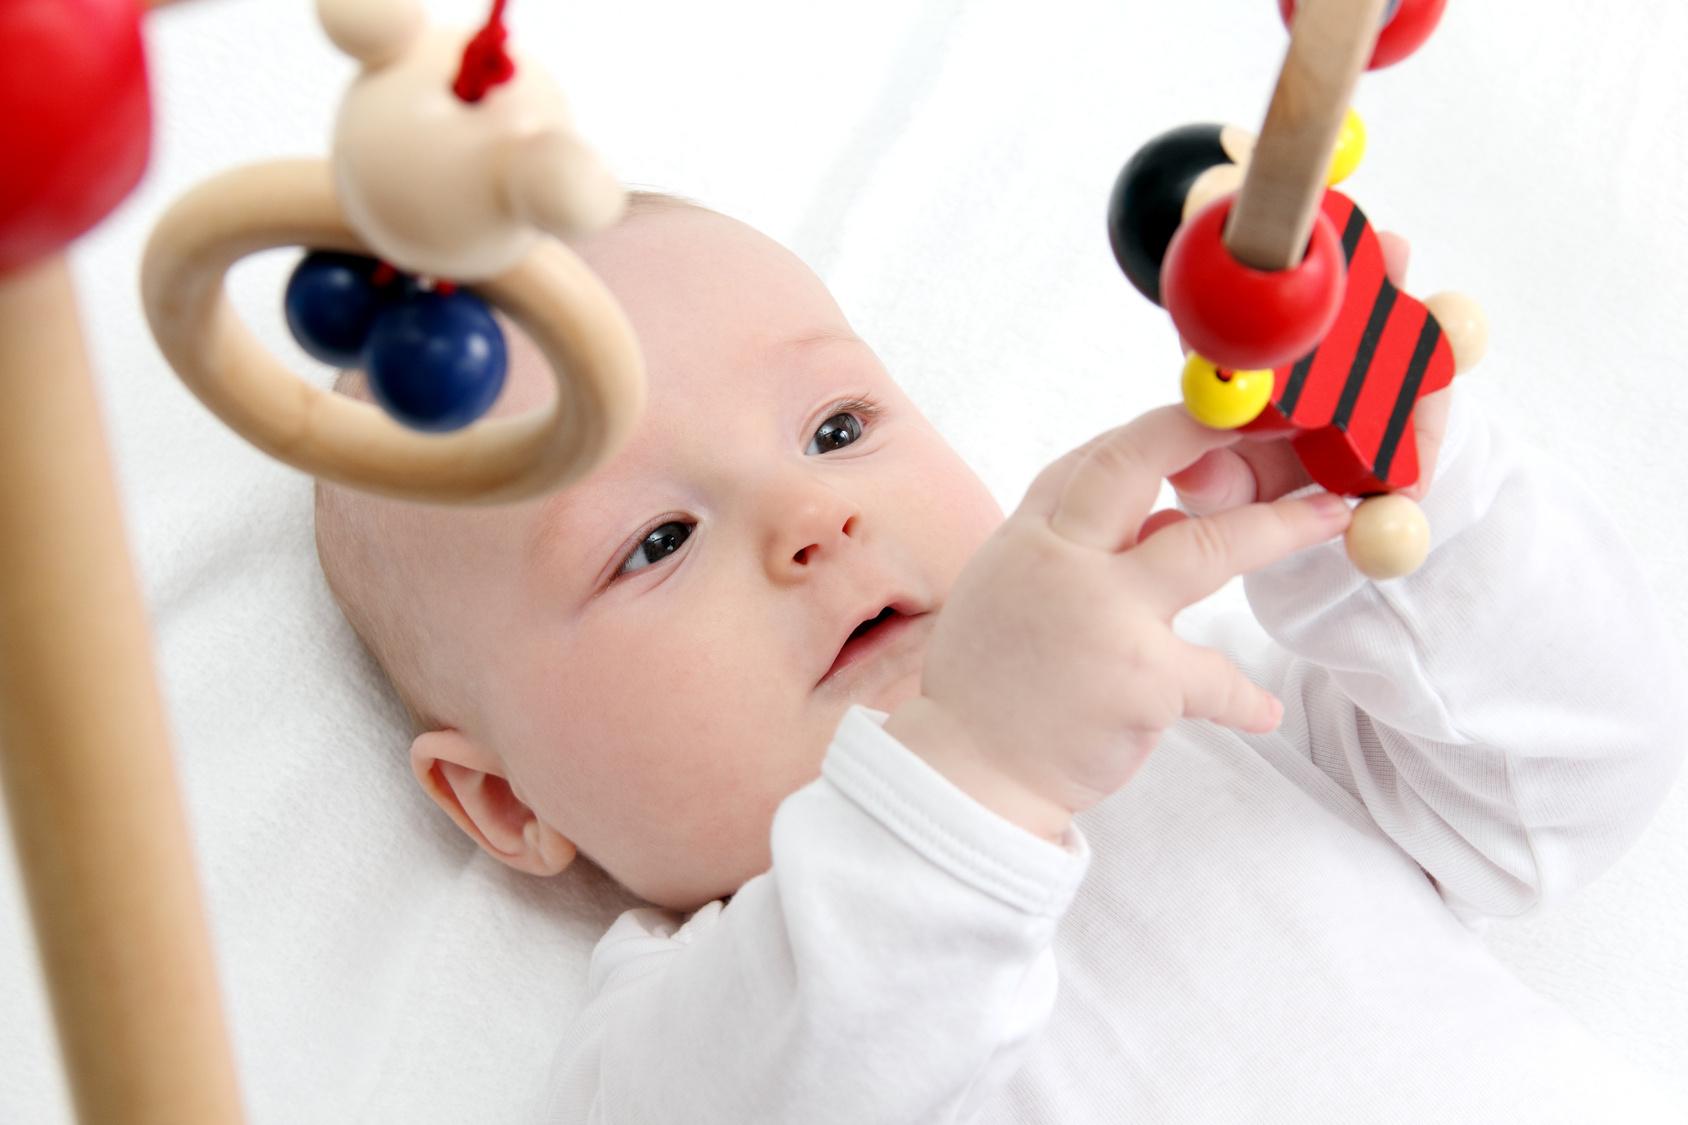 Развития ребенка по месяцам до года фото